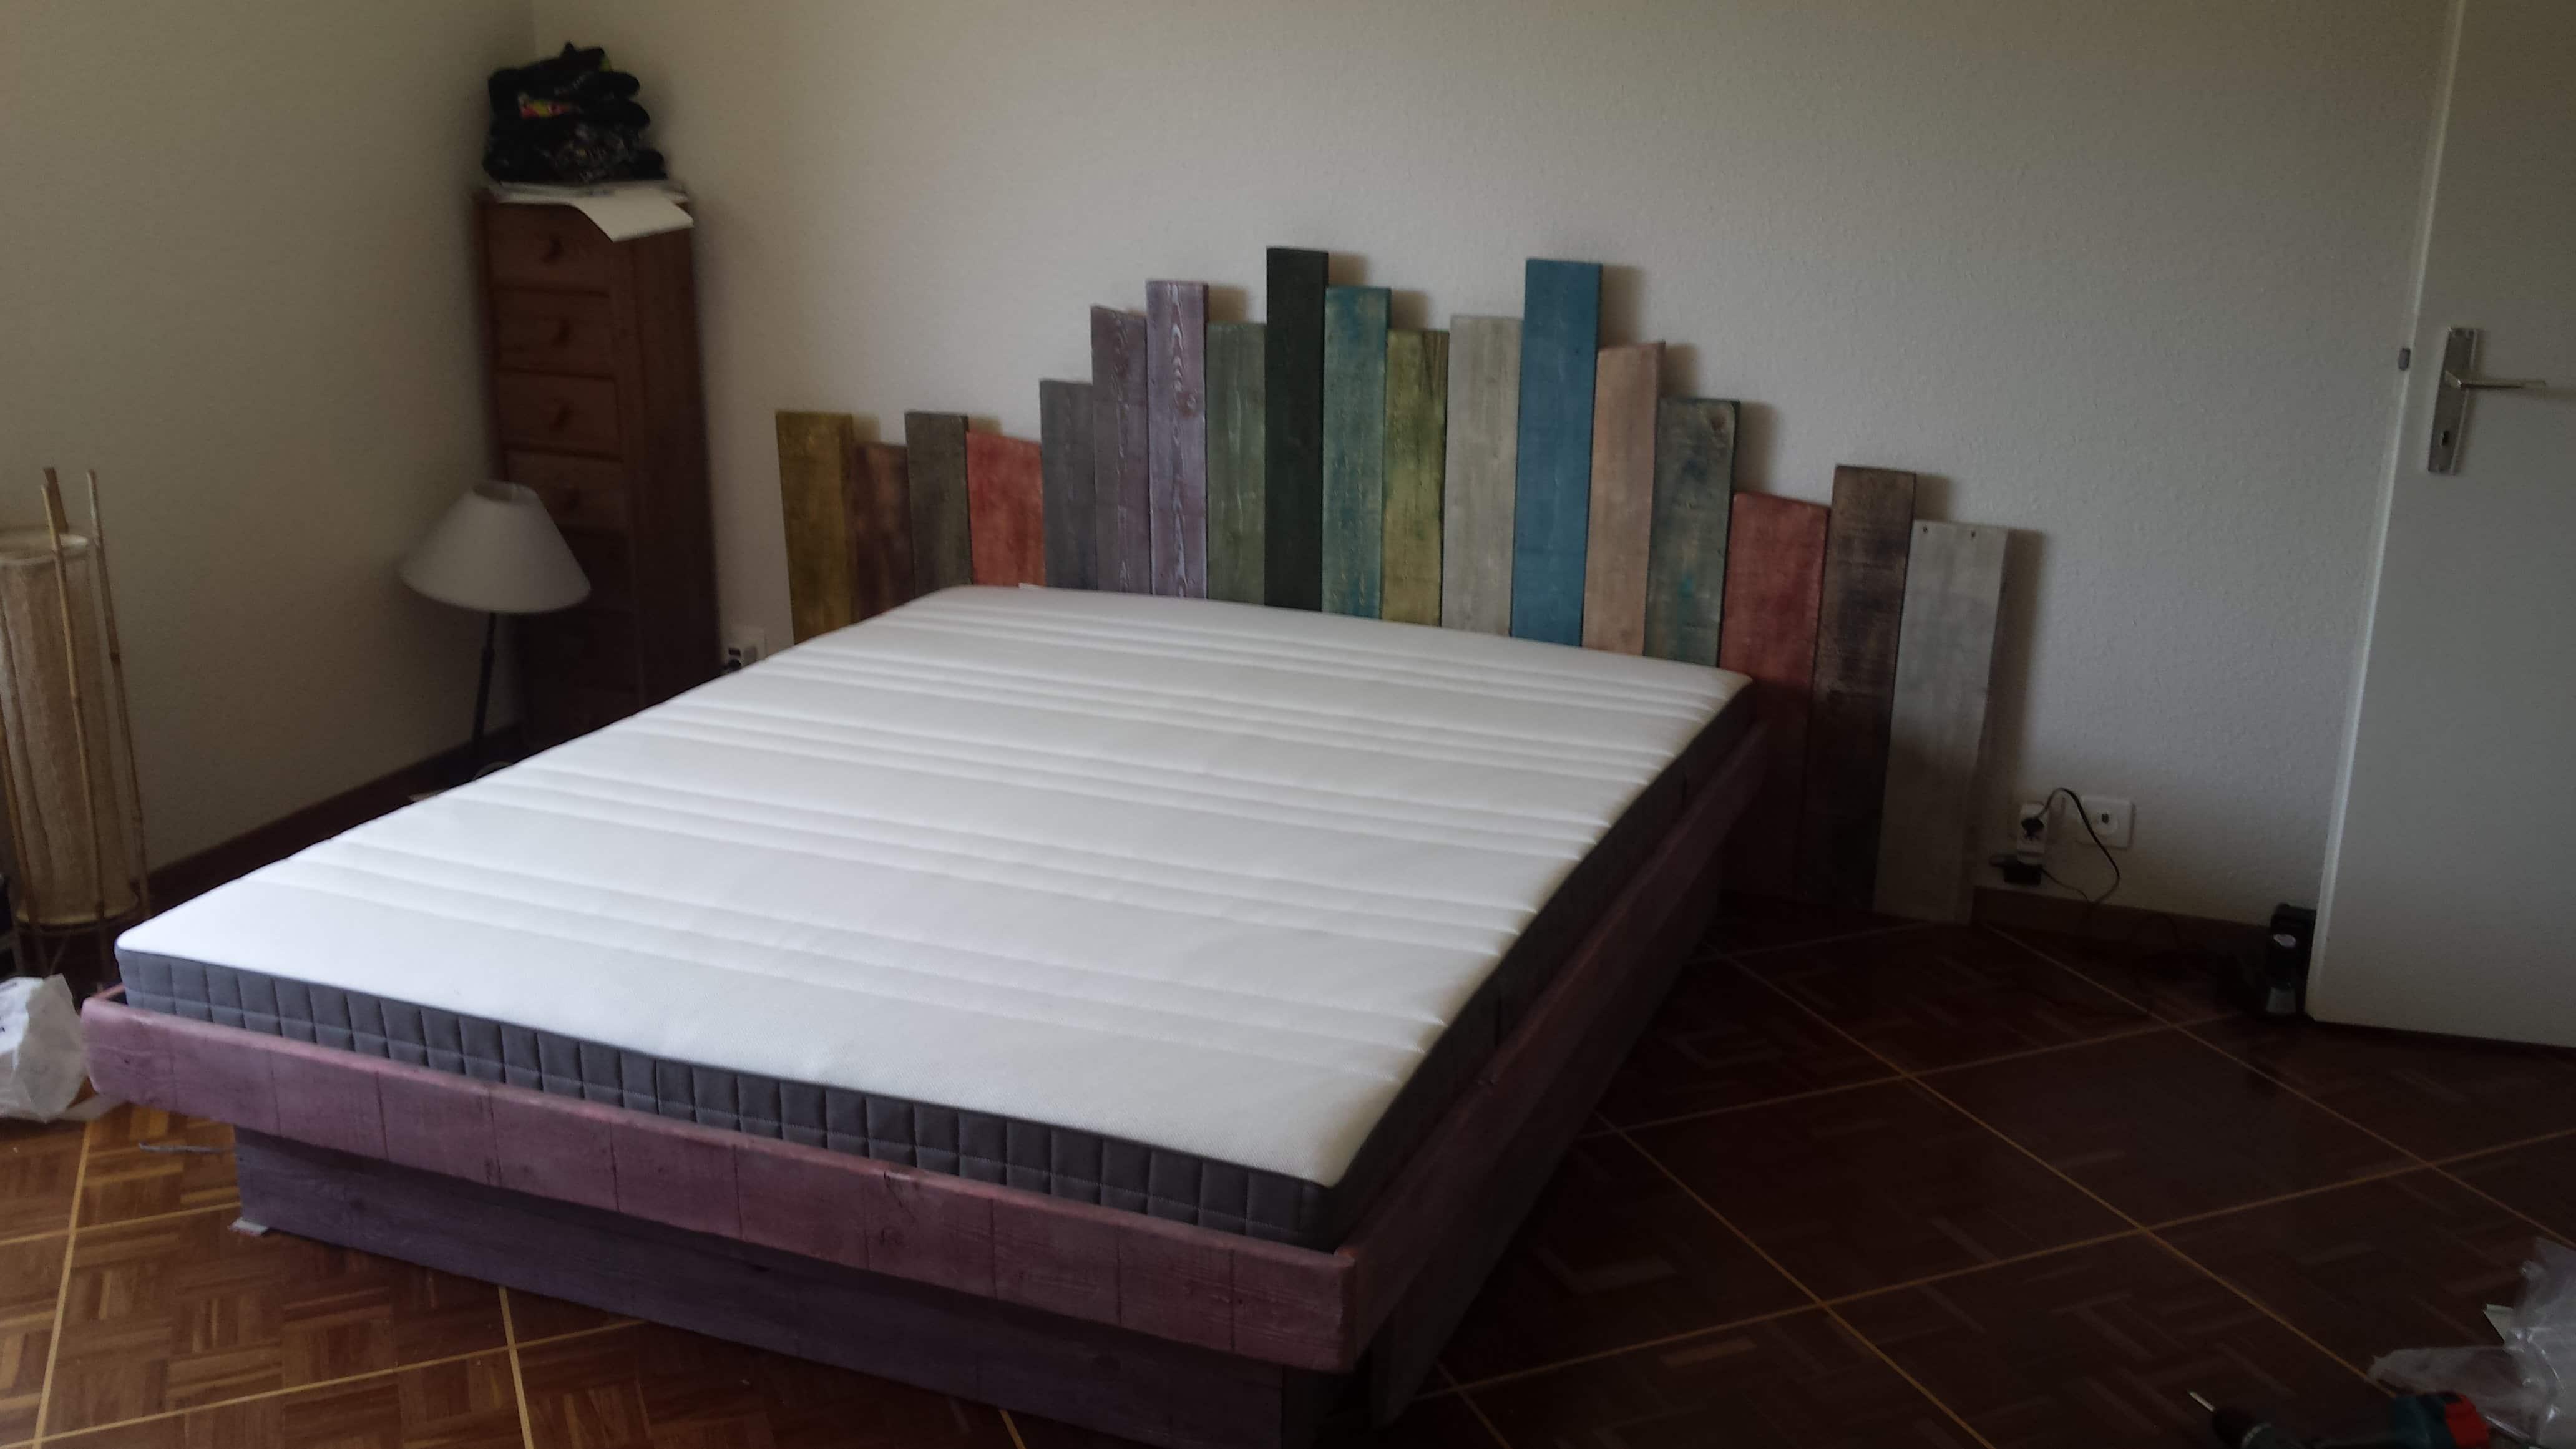 Camas de palets good camas hechas con palets de madera - Hacer cama con palets ...